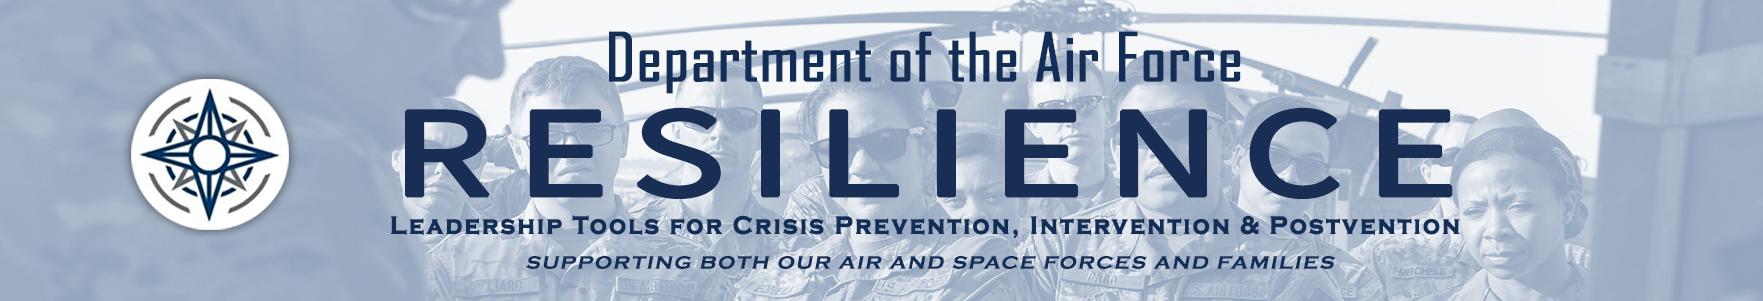 USAF Resilience